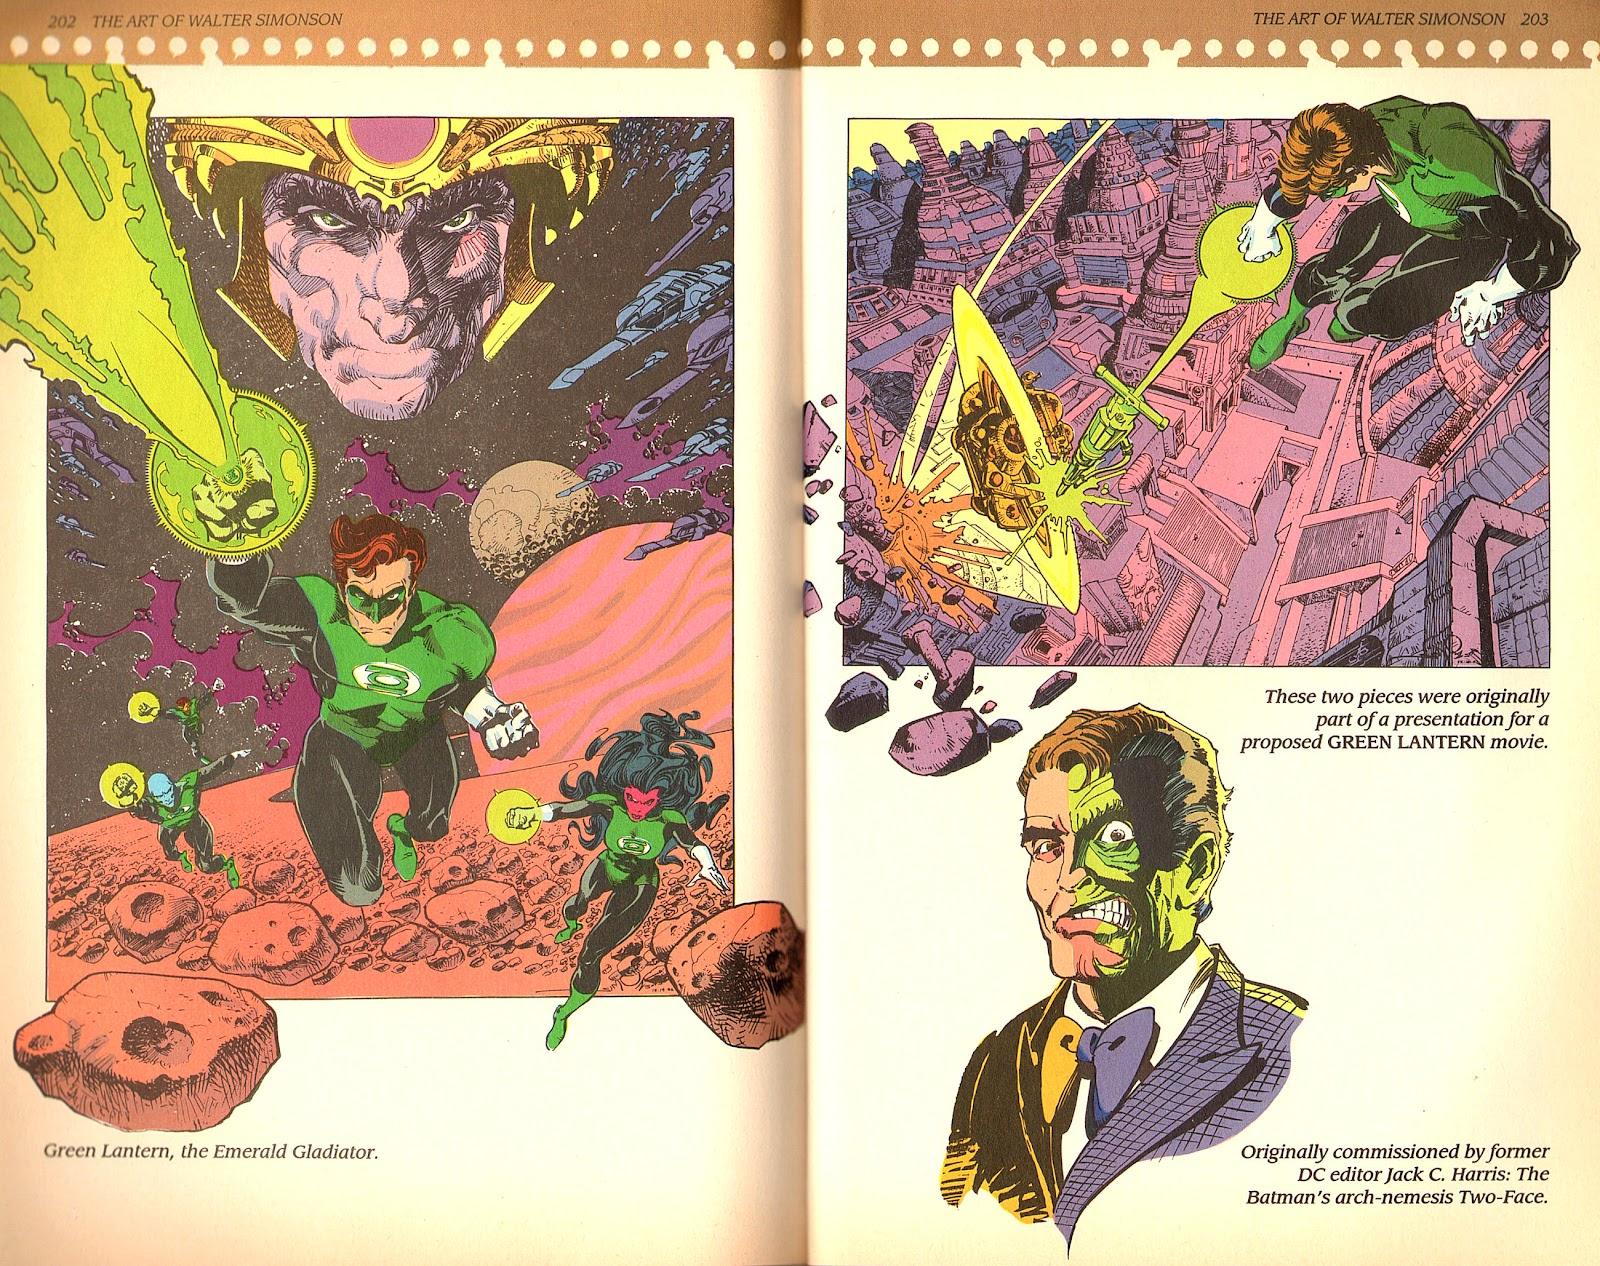 Read online The Art of Walter Simonson comic -  Issue # TPB - 103